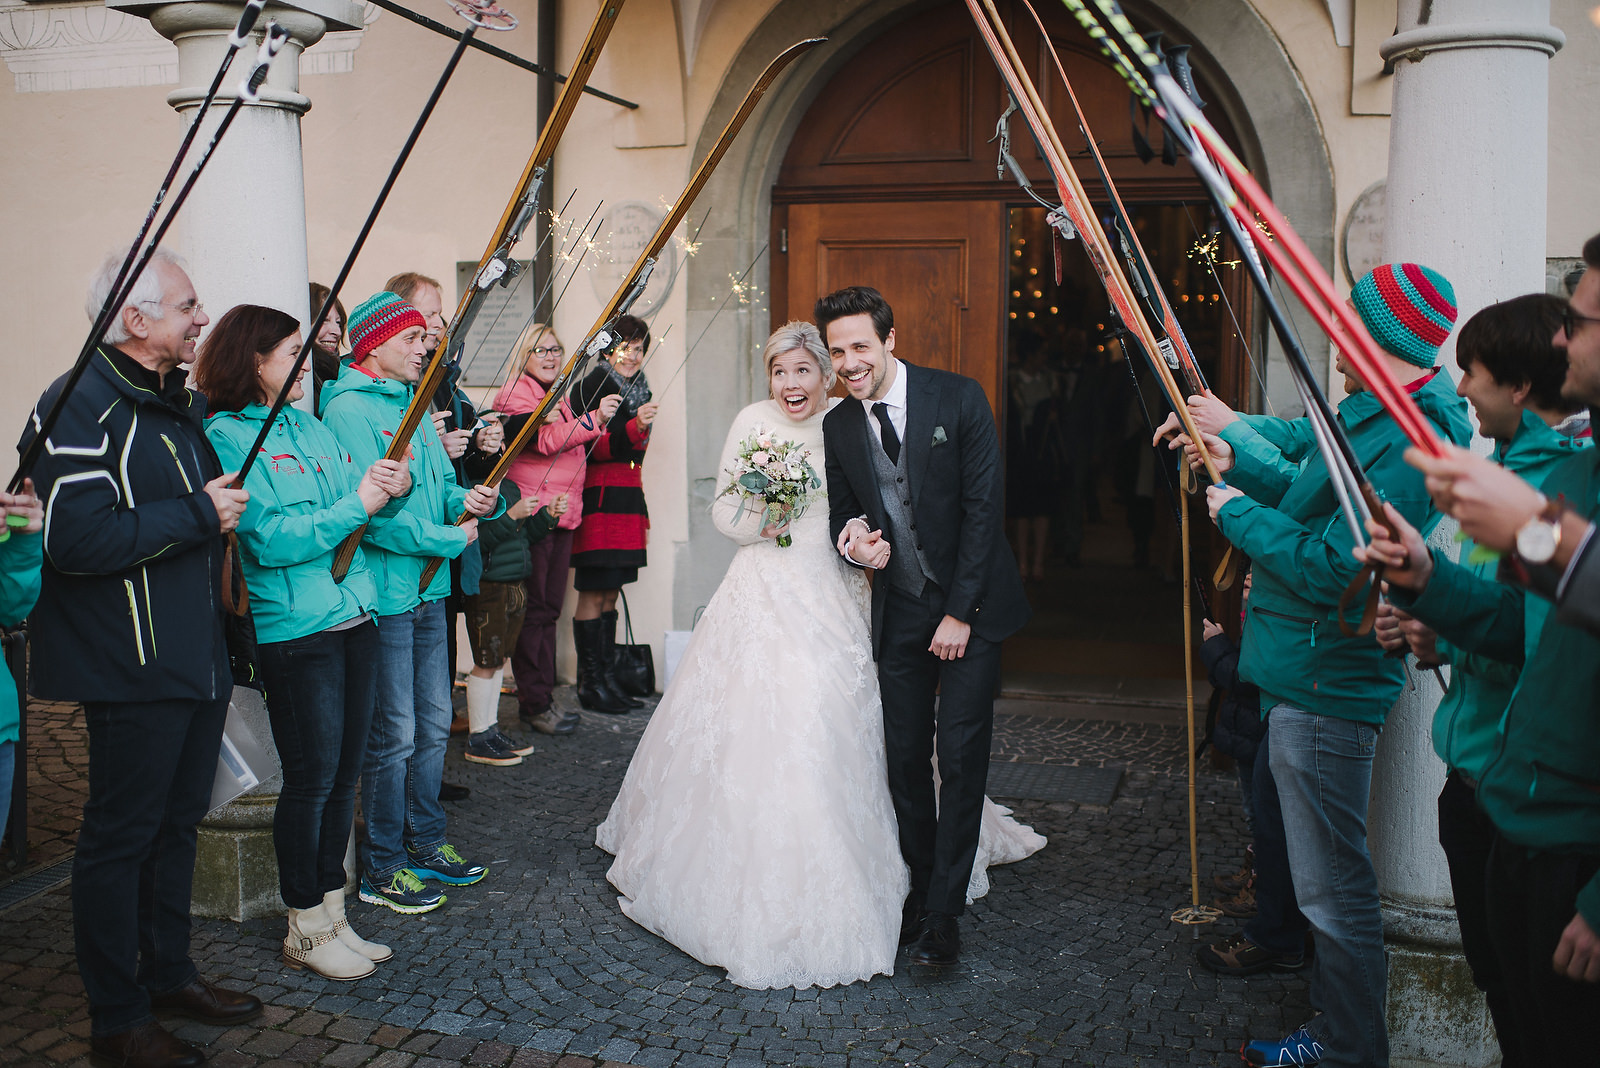 Fotograf Konstanz - Silvester Wedding in Hagnau / Friedrichshafen at Lake of Constance  - 22 -